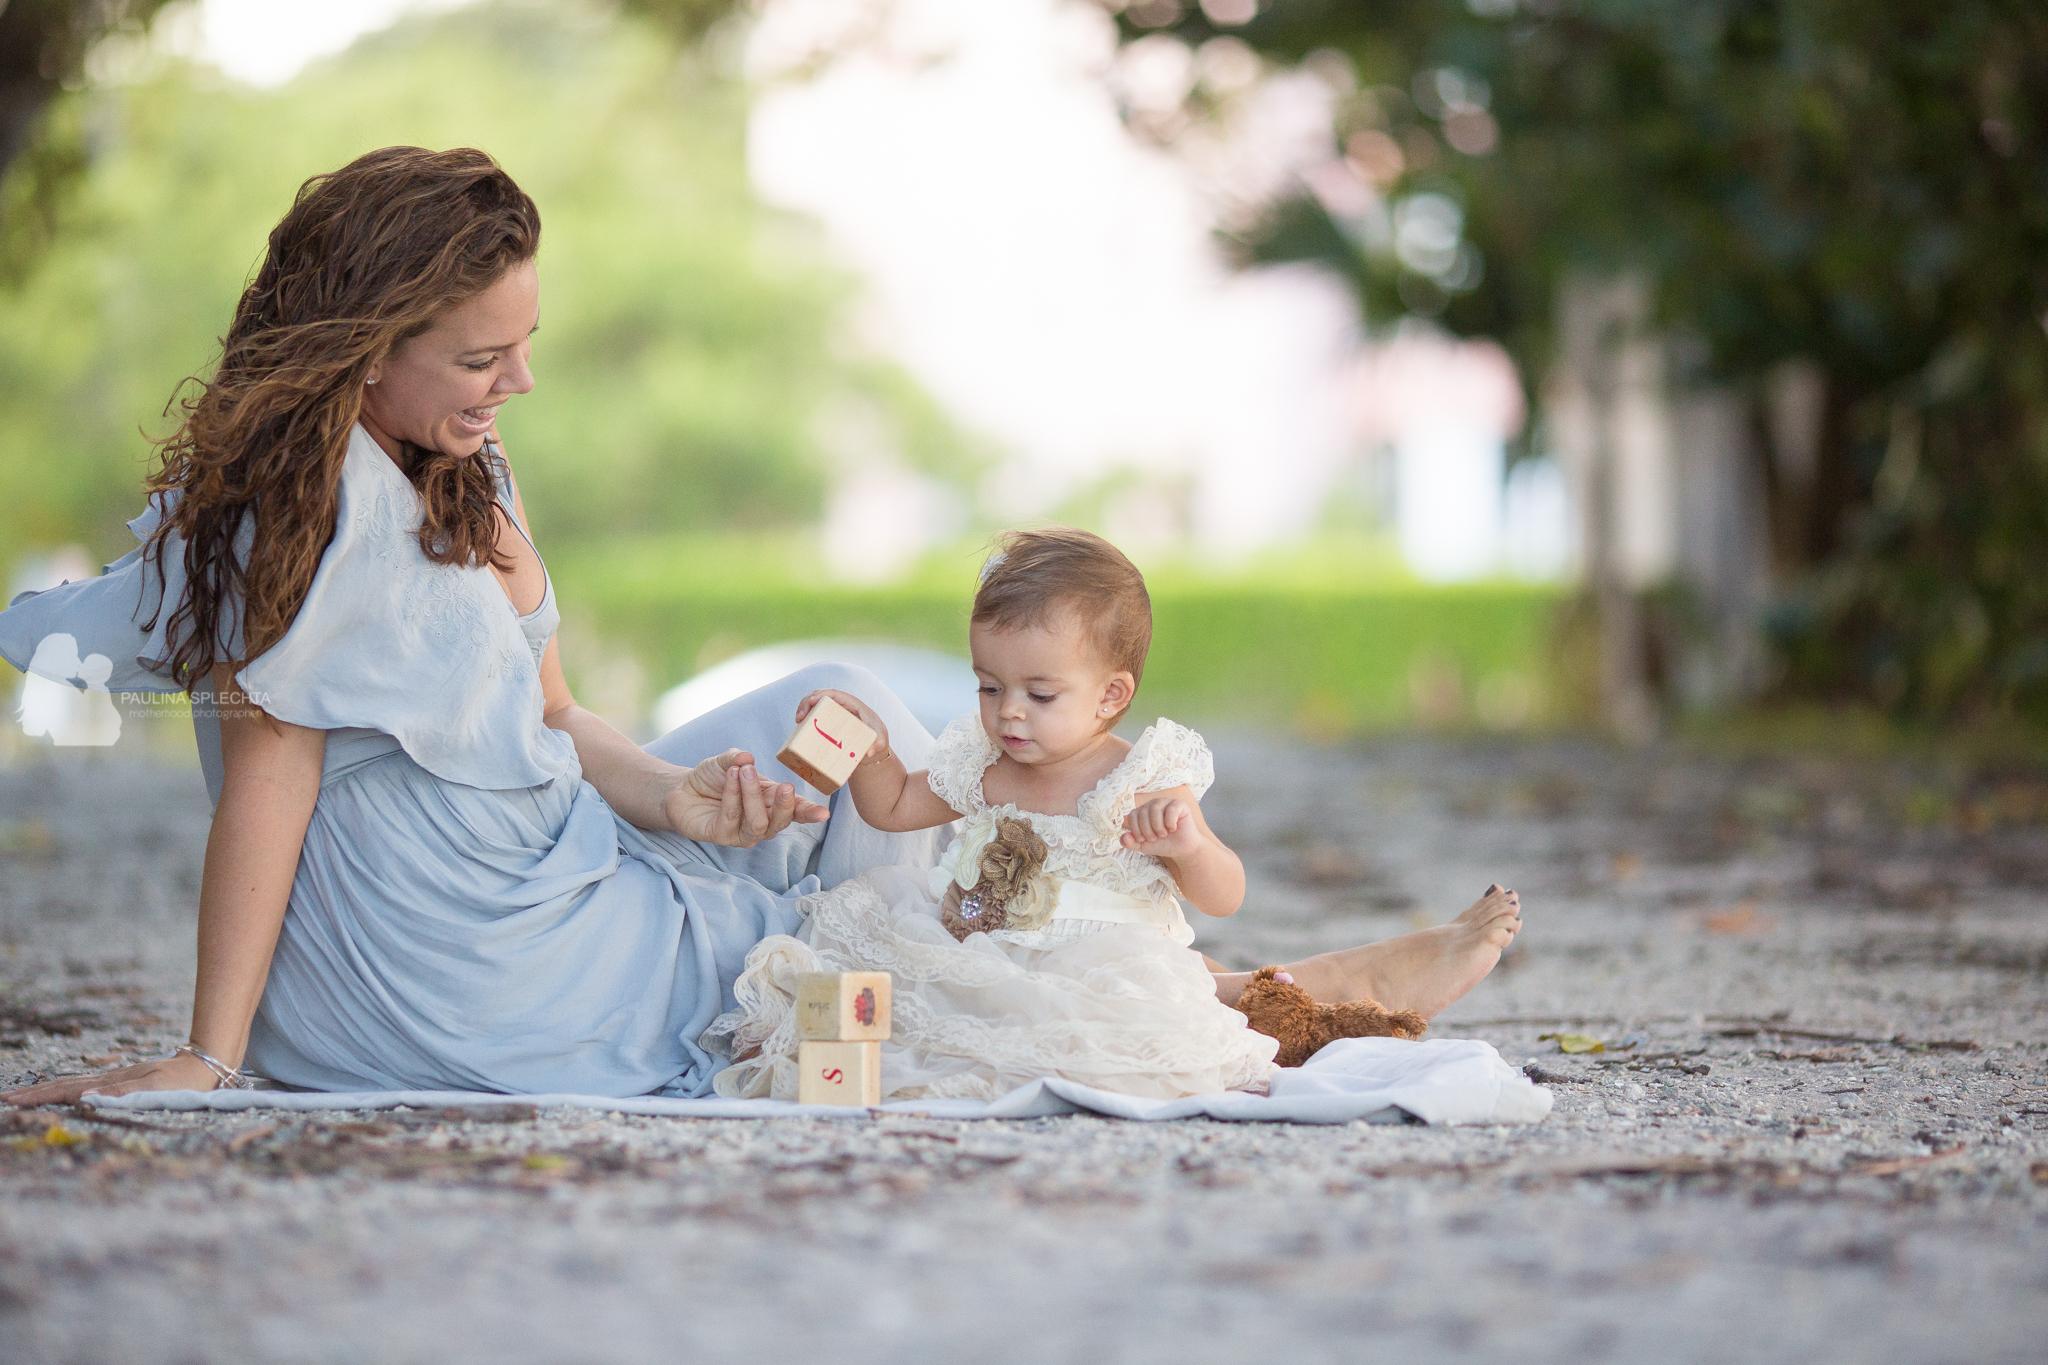 birth-photographer-breastfeeding-family-child-newborn-cake-smash-pregnancy-maternity-16.jpg